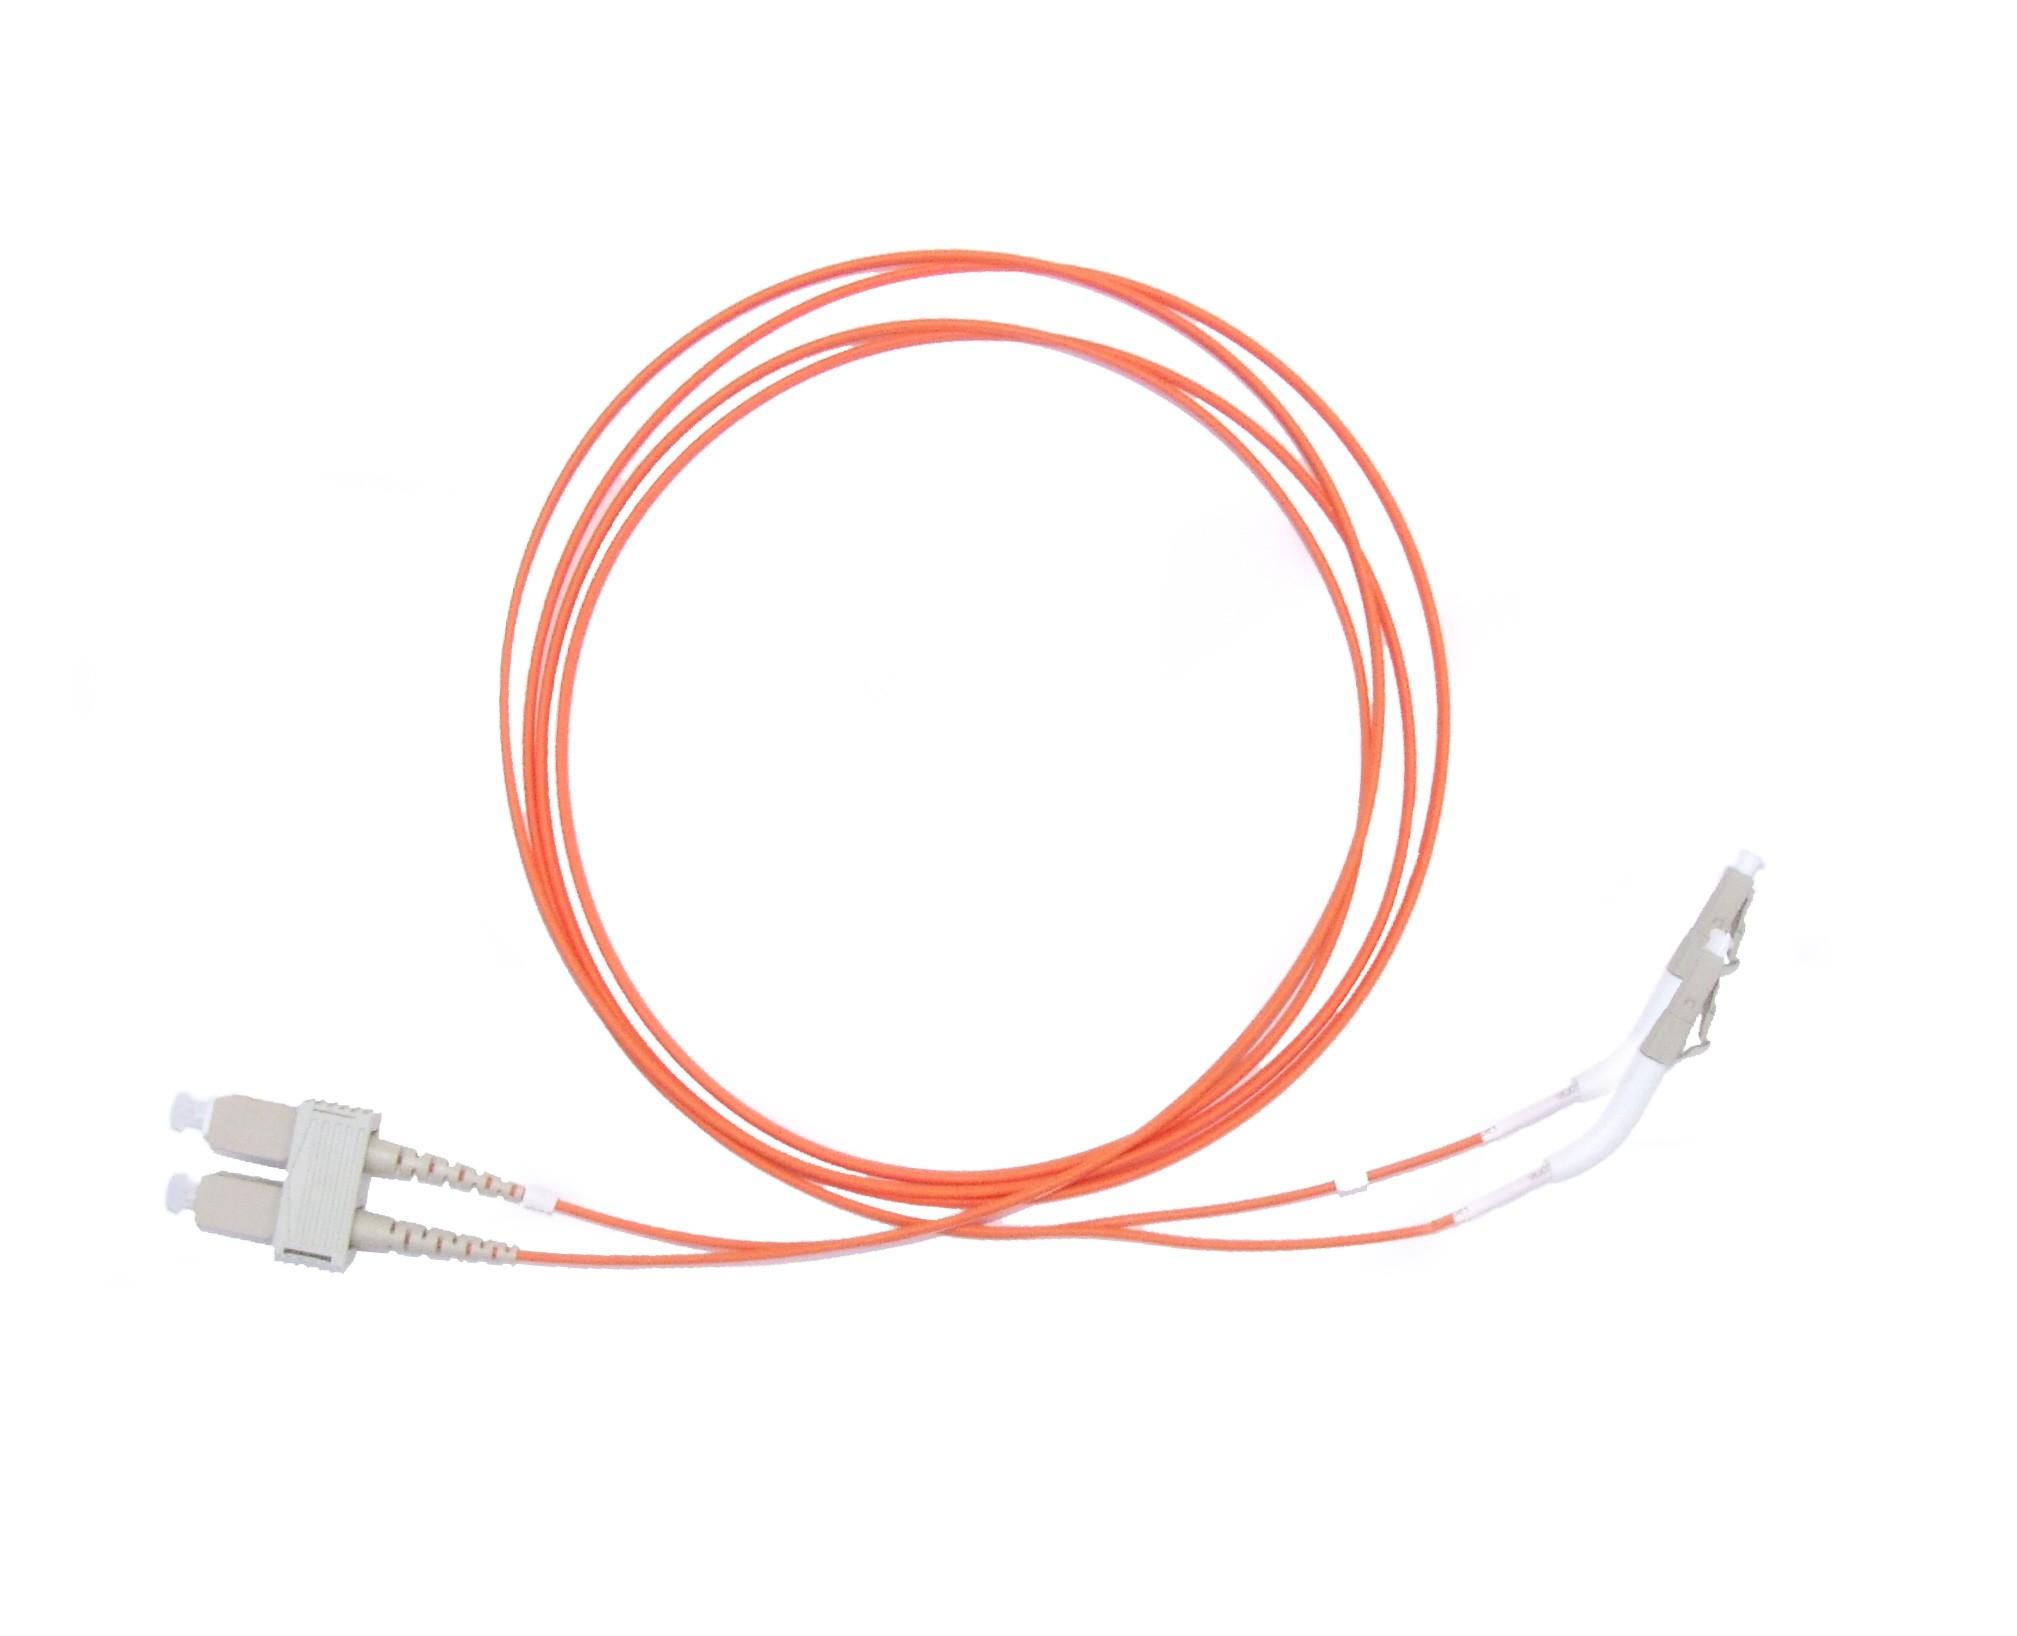 LC 45 deg boot - SC Multimode fibre patch lead 62.5/125 OM1 Duplex 2.5m